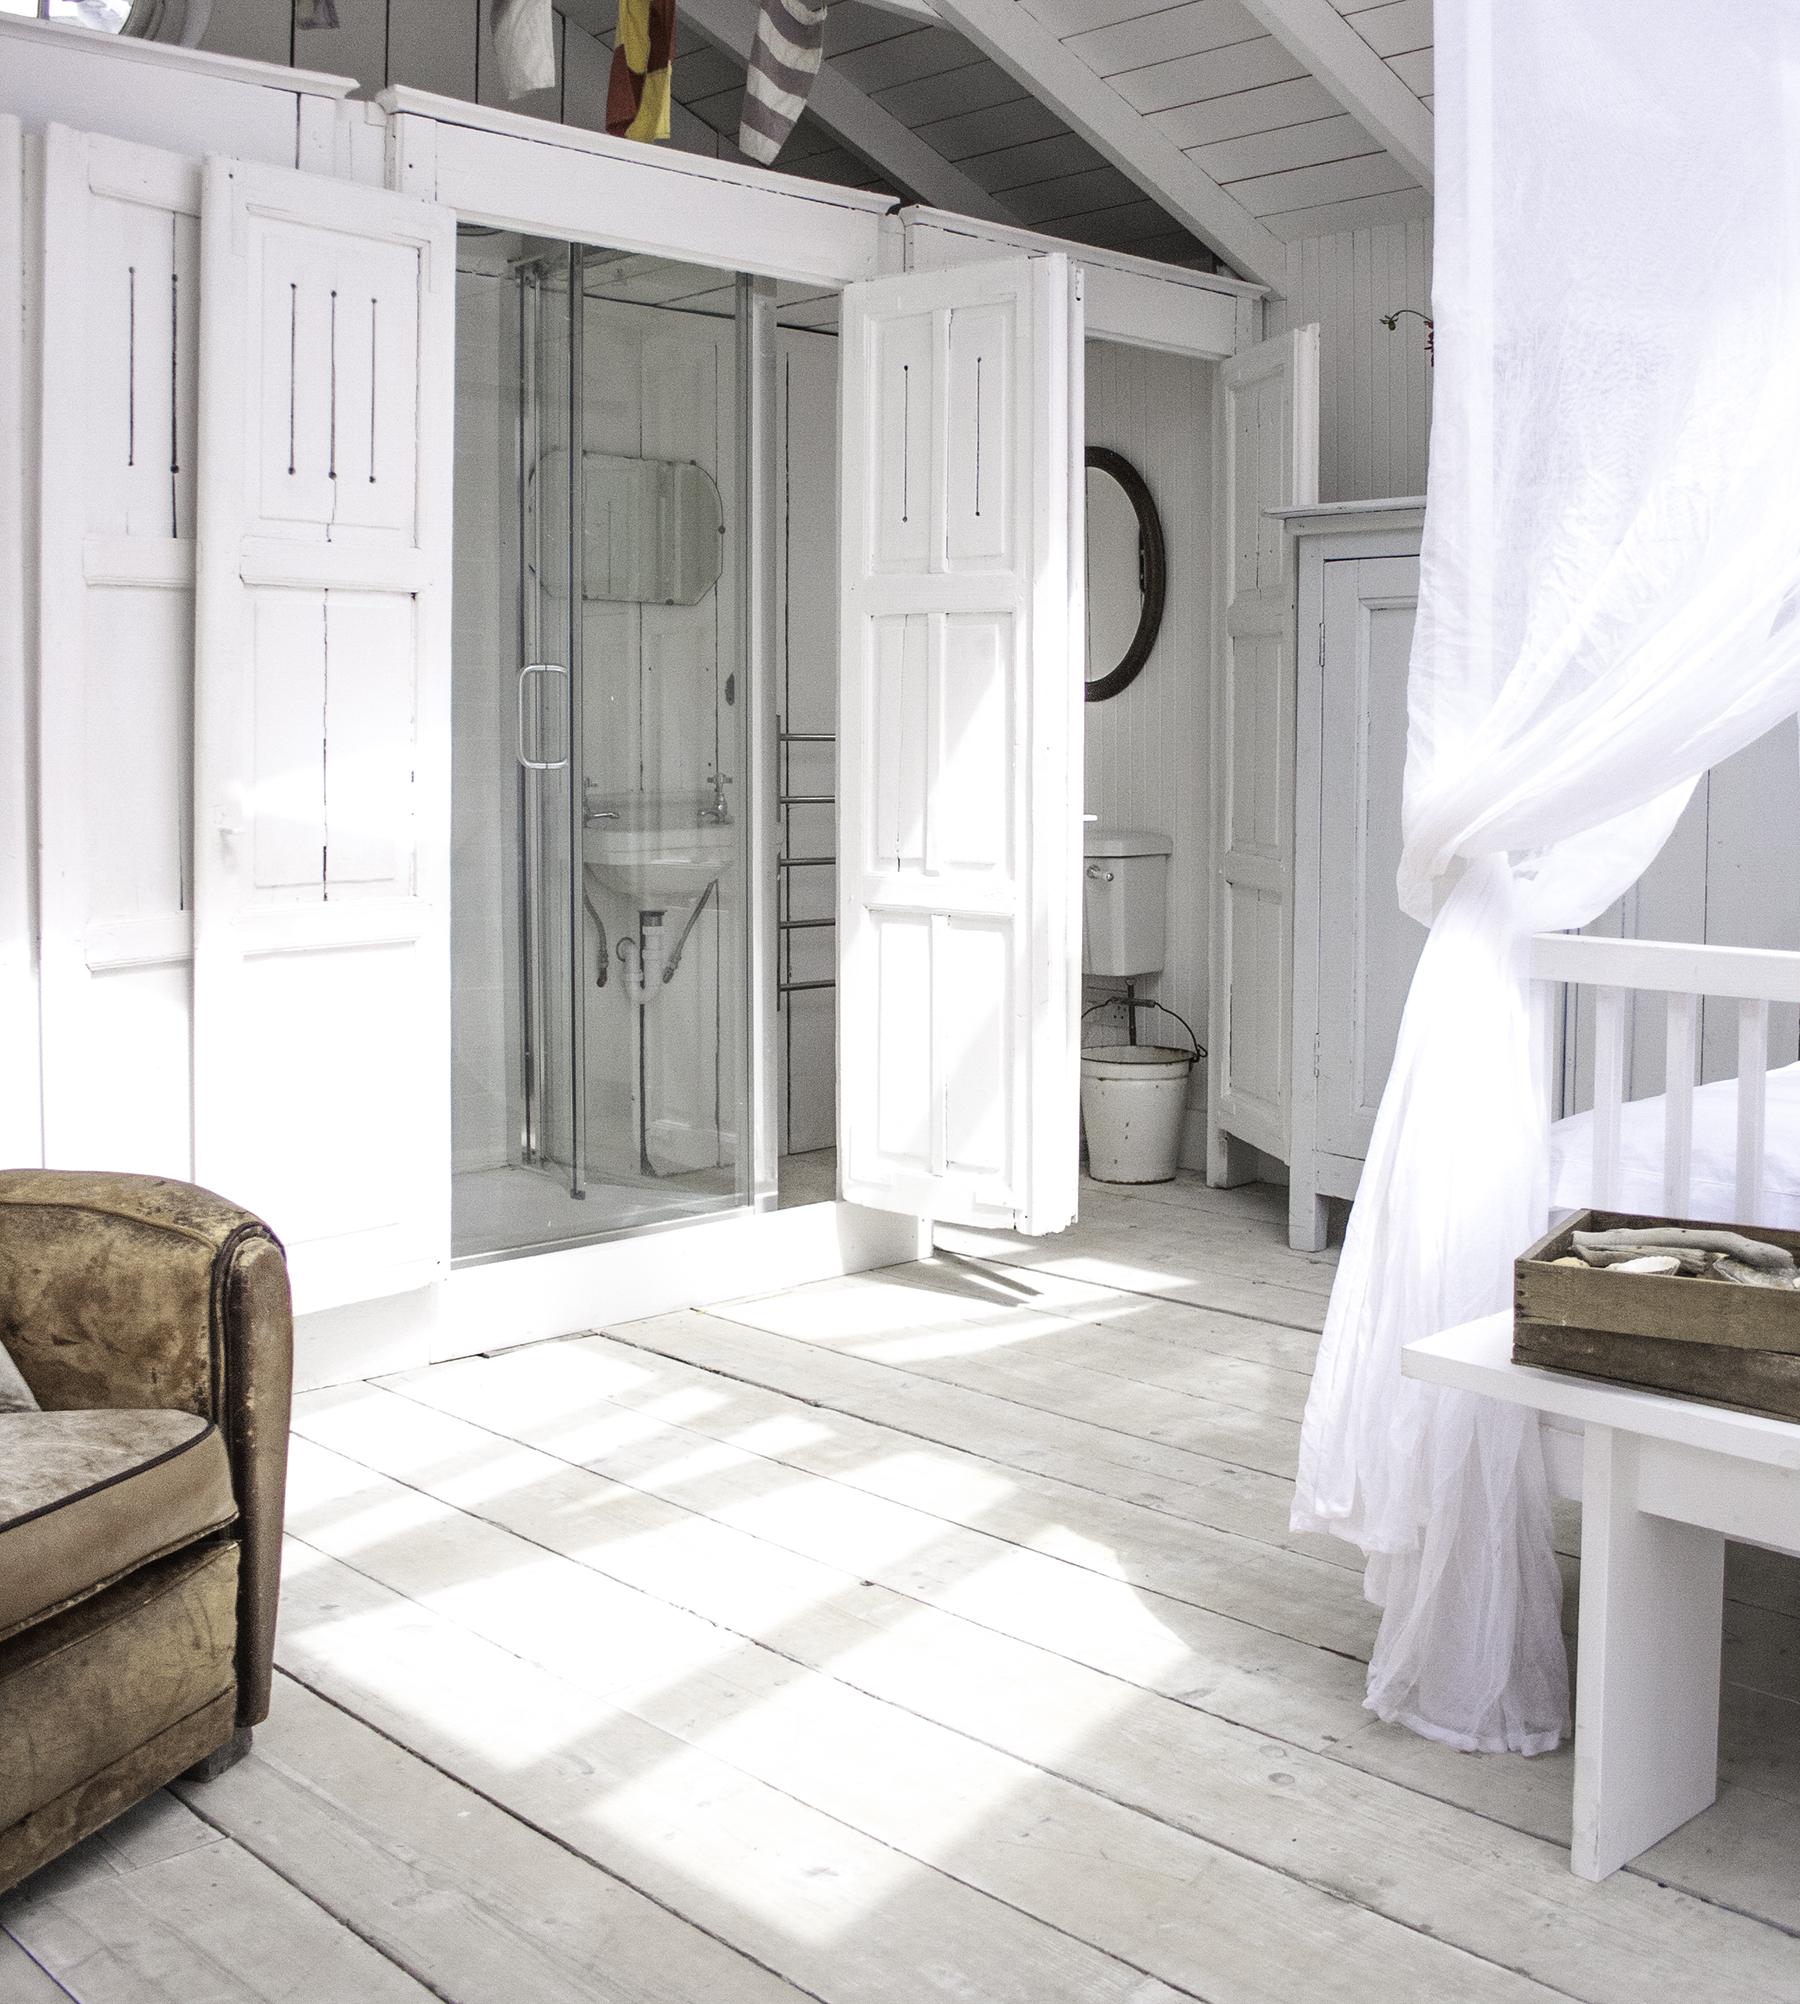 Bathroom in cabin